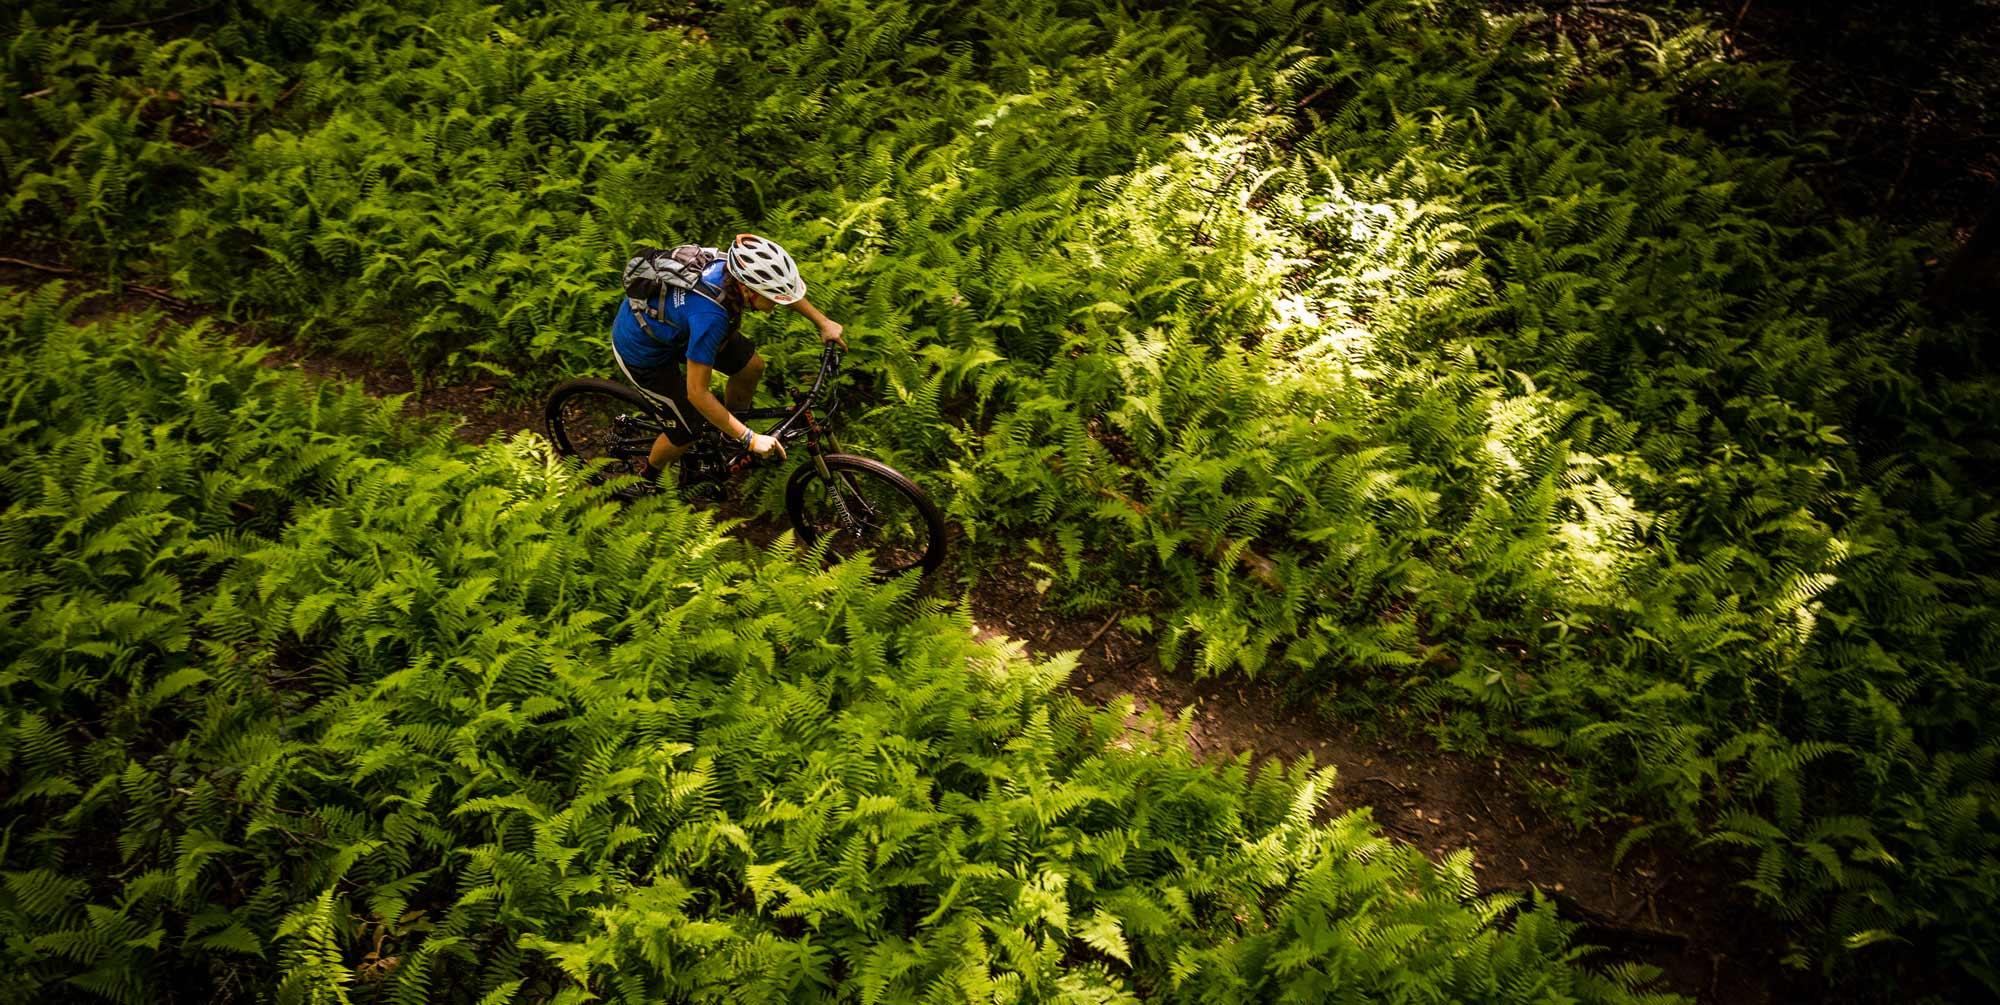 biking-at-the-bike-farm.jpg